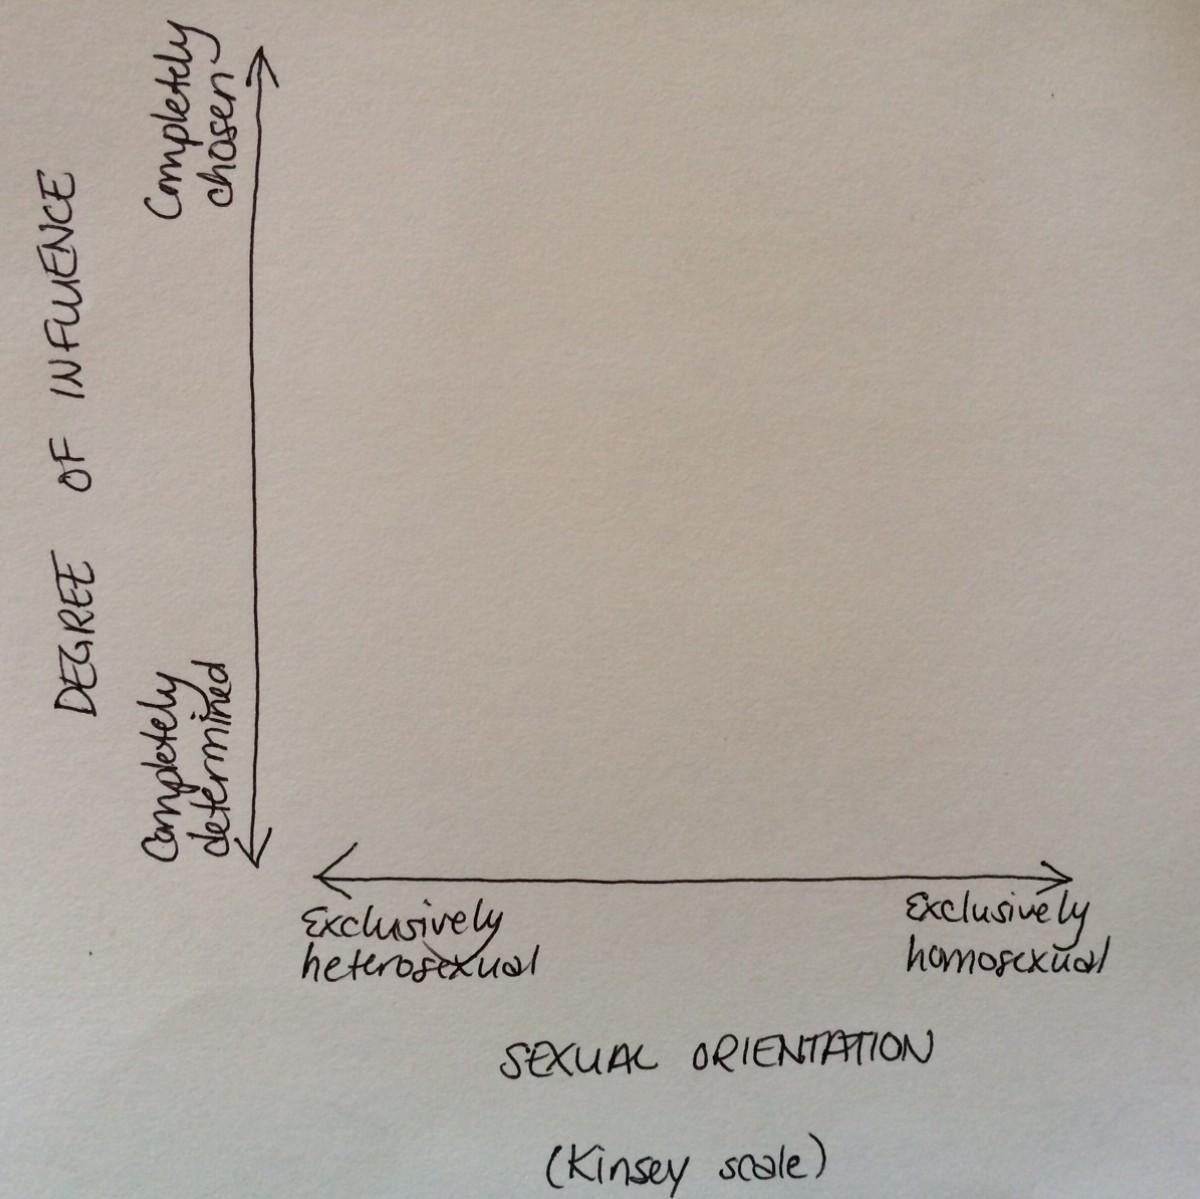 Sexual orientation beliefs scale